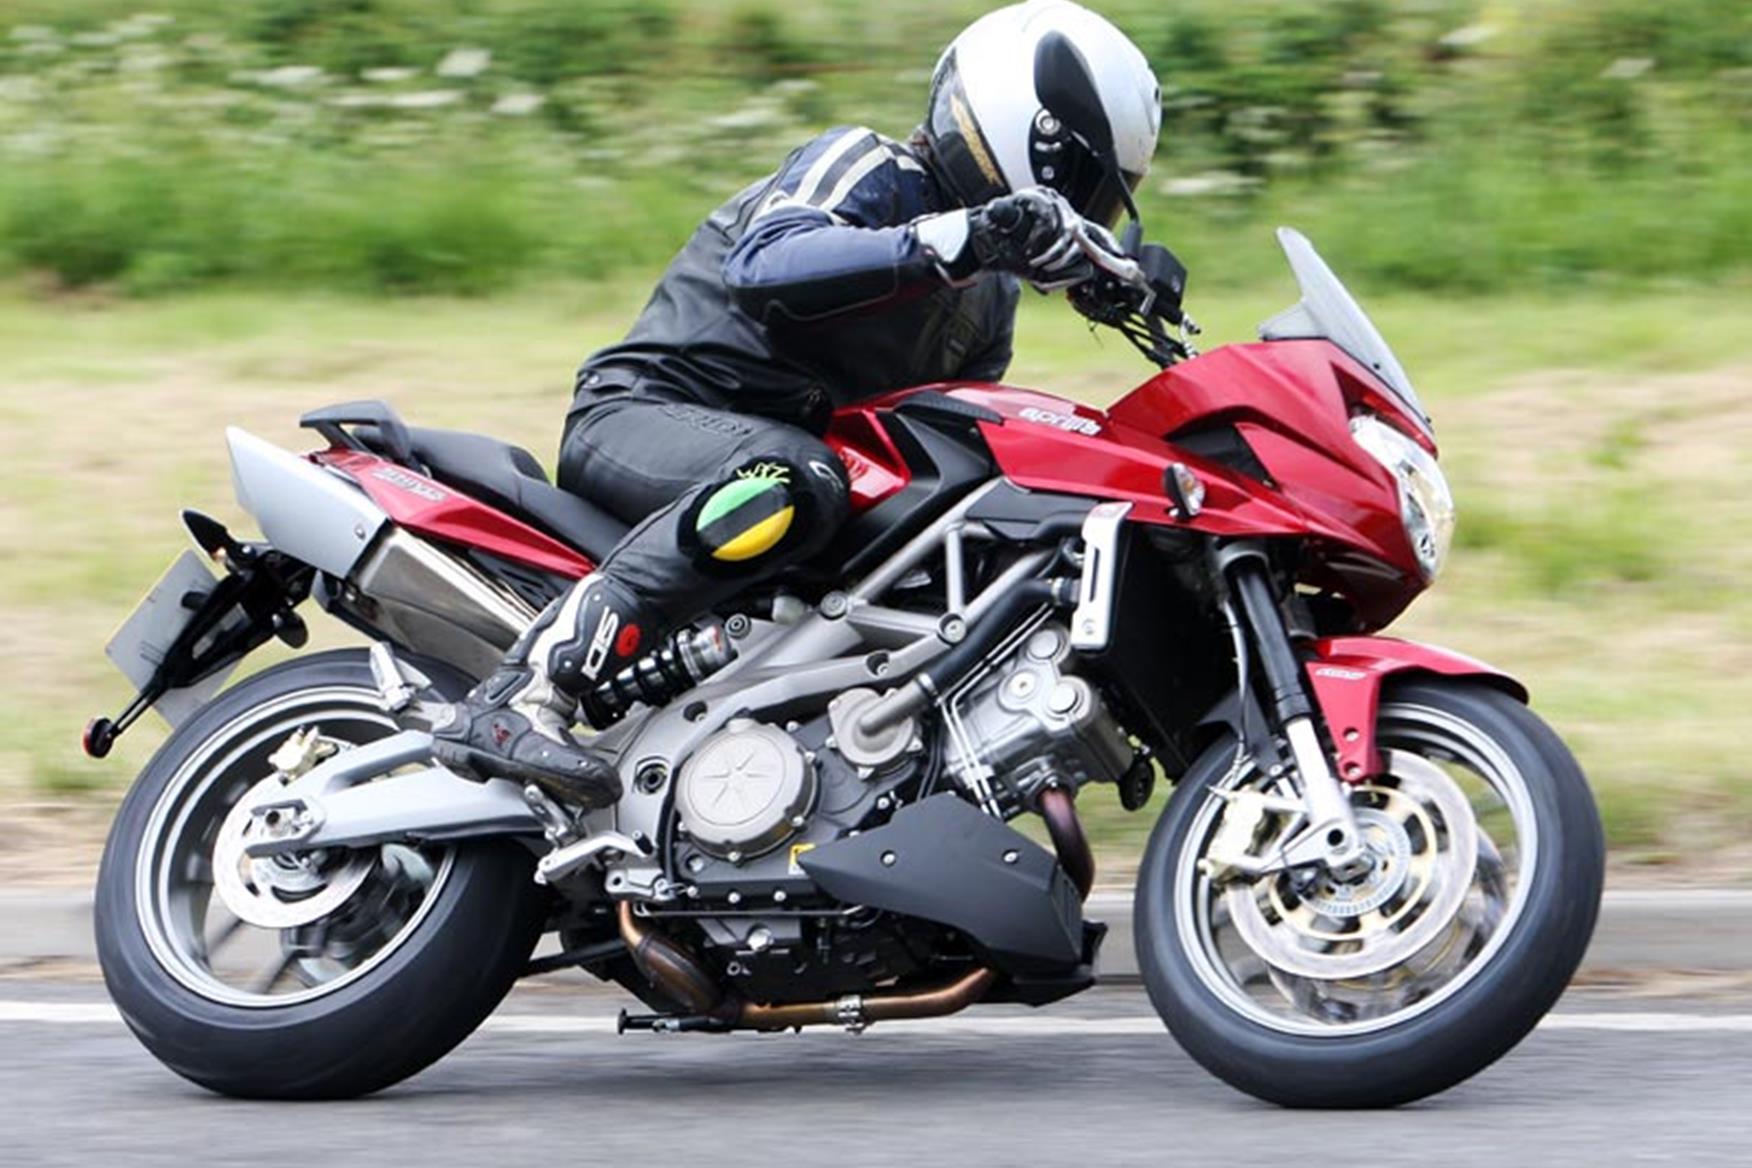 Motorcycle Rear Brake Pads for APRILIA Shiver 750 GT 2009 2010 2011 2012